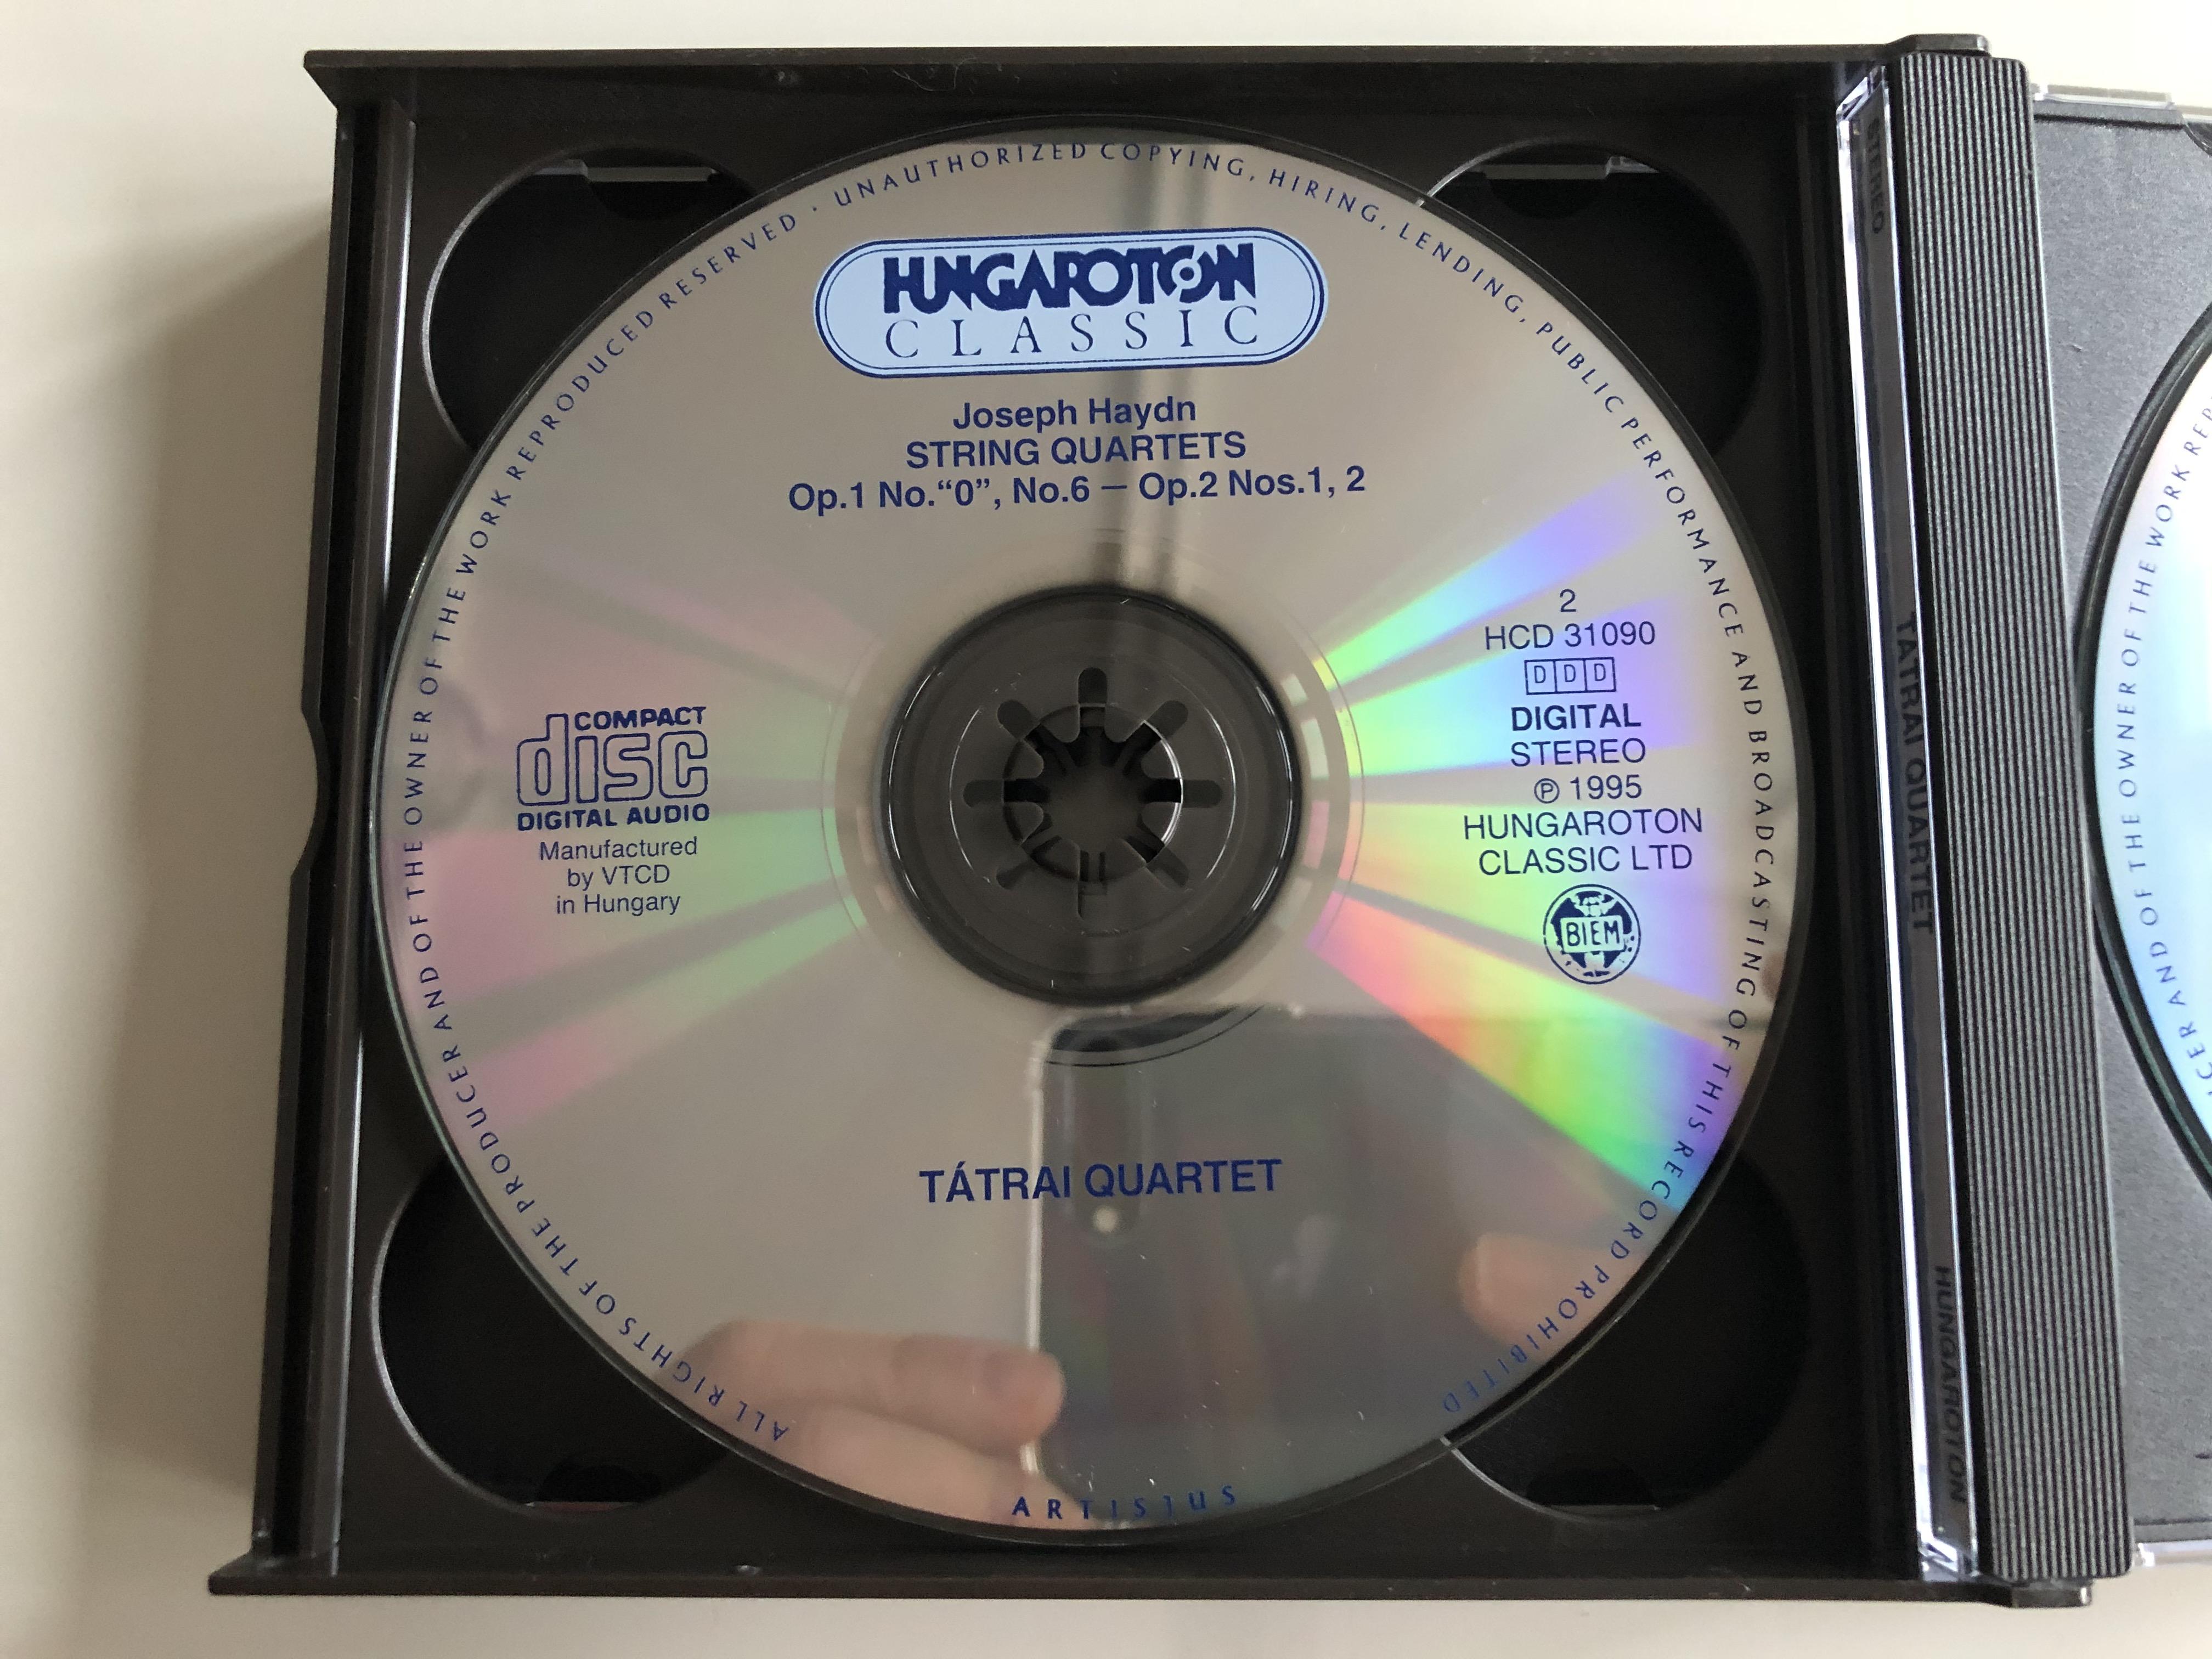 joseph-haydn-string-quartets-opp.1-2-42-103-t-trai-quartet-hungaroton-classic-3x-audio-cd-1995-stereo-hcd-31089-91-3-.jpg